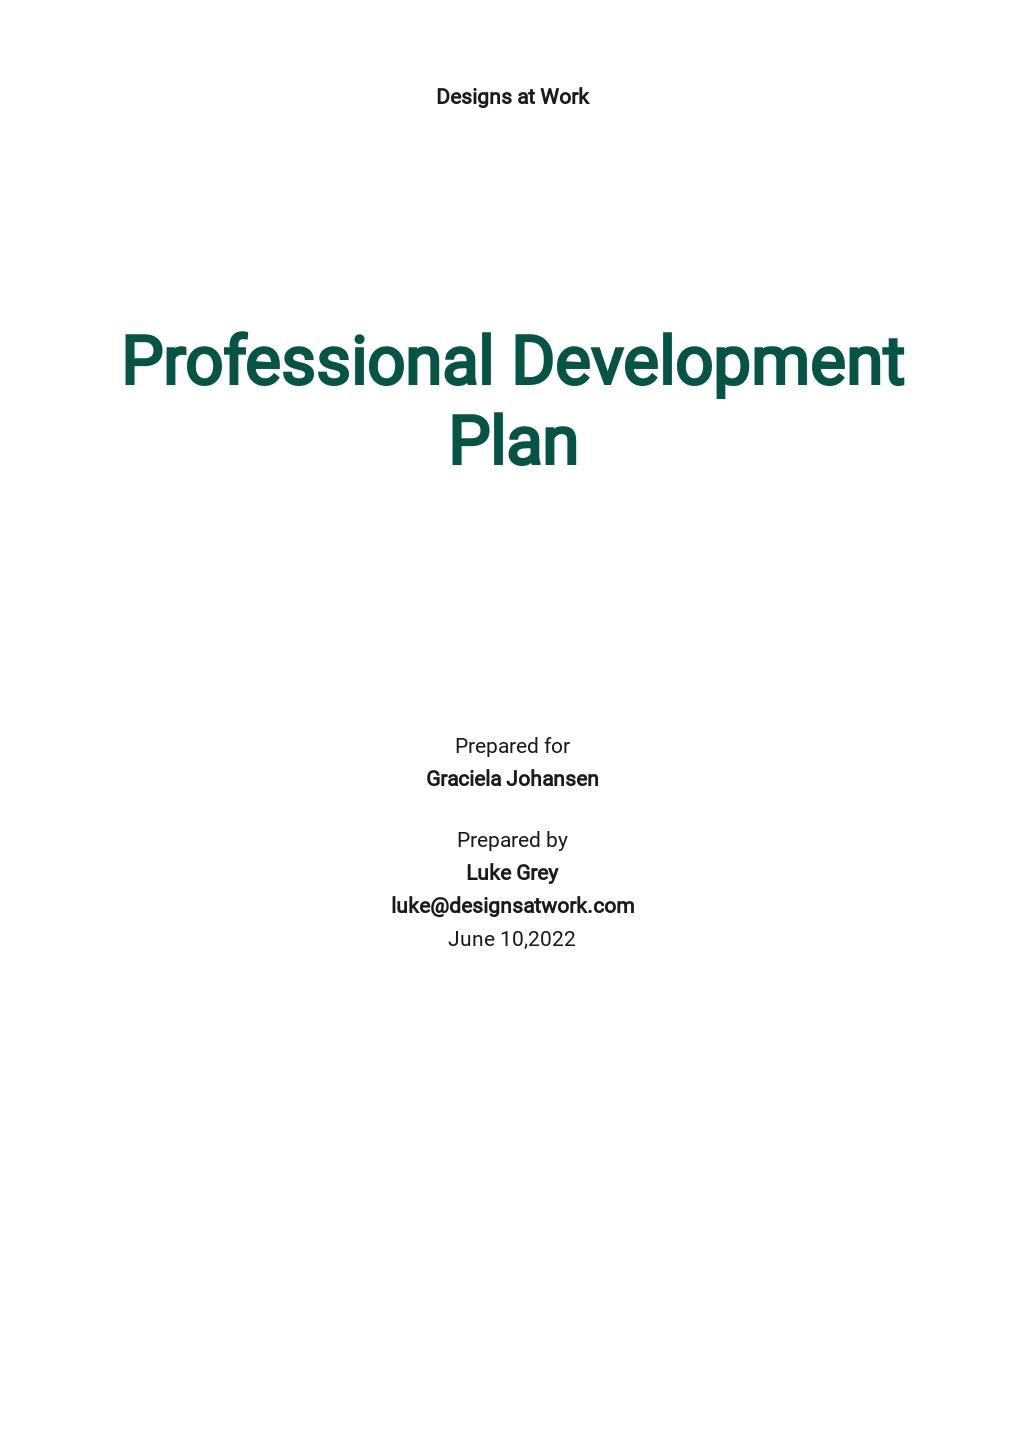 Professional Development Plan Template.jpe